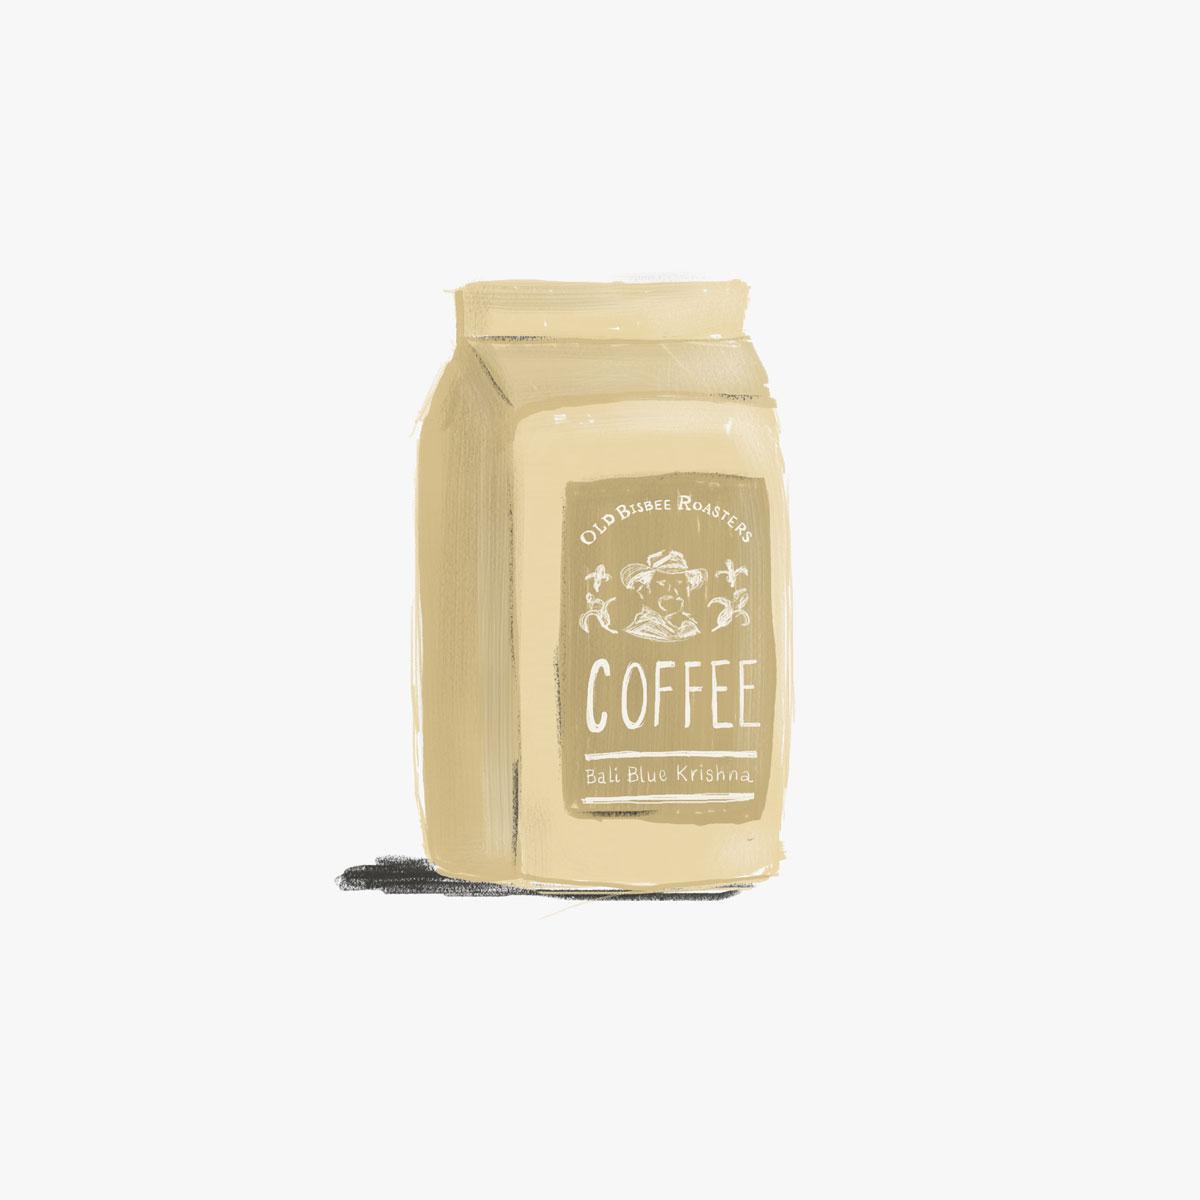 047-Coffee.jpg